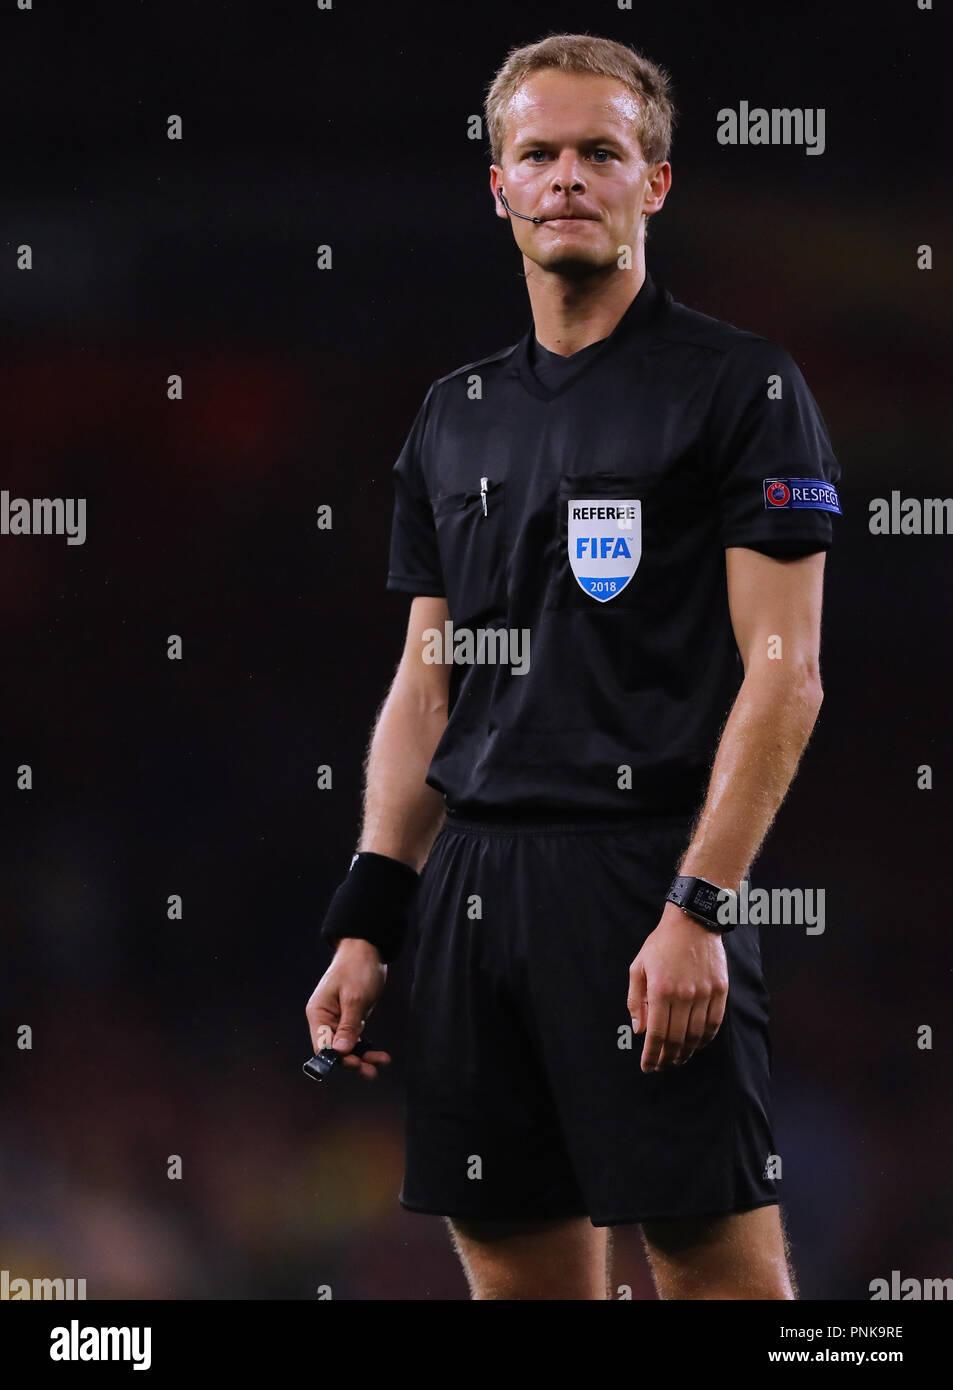 Referee, Bart Vertenten - Arsenal v Vorskla Poltava, UEFA Europa League - Group E, Emirates Stadium, London (Holloway) - 20th September 2018 - Stock Image